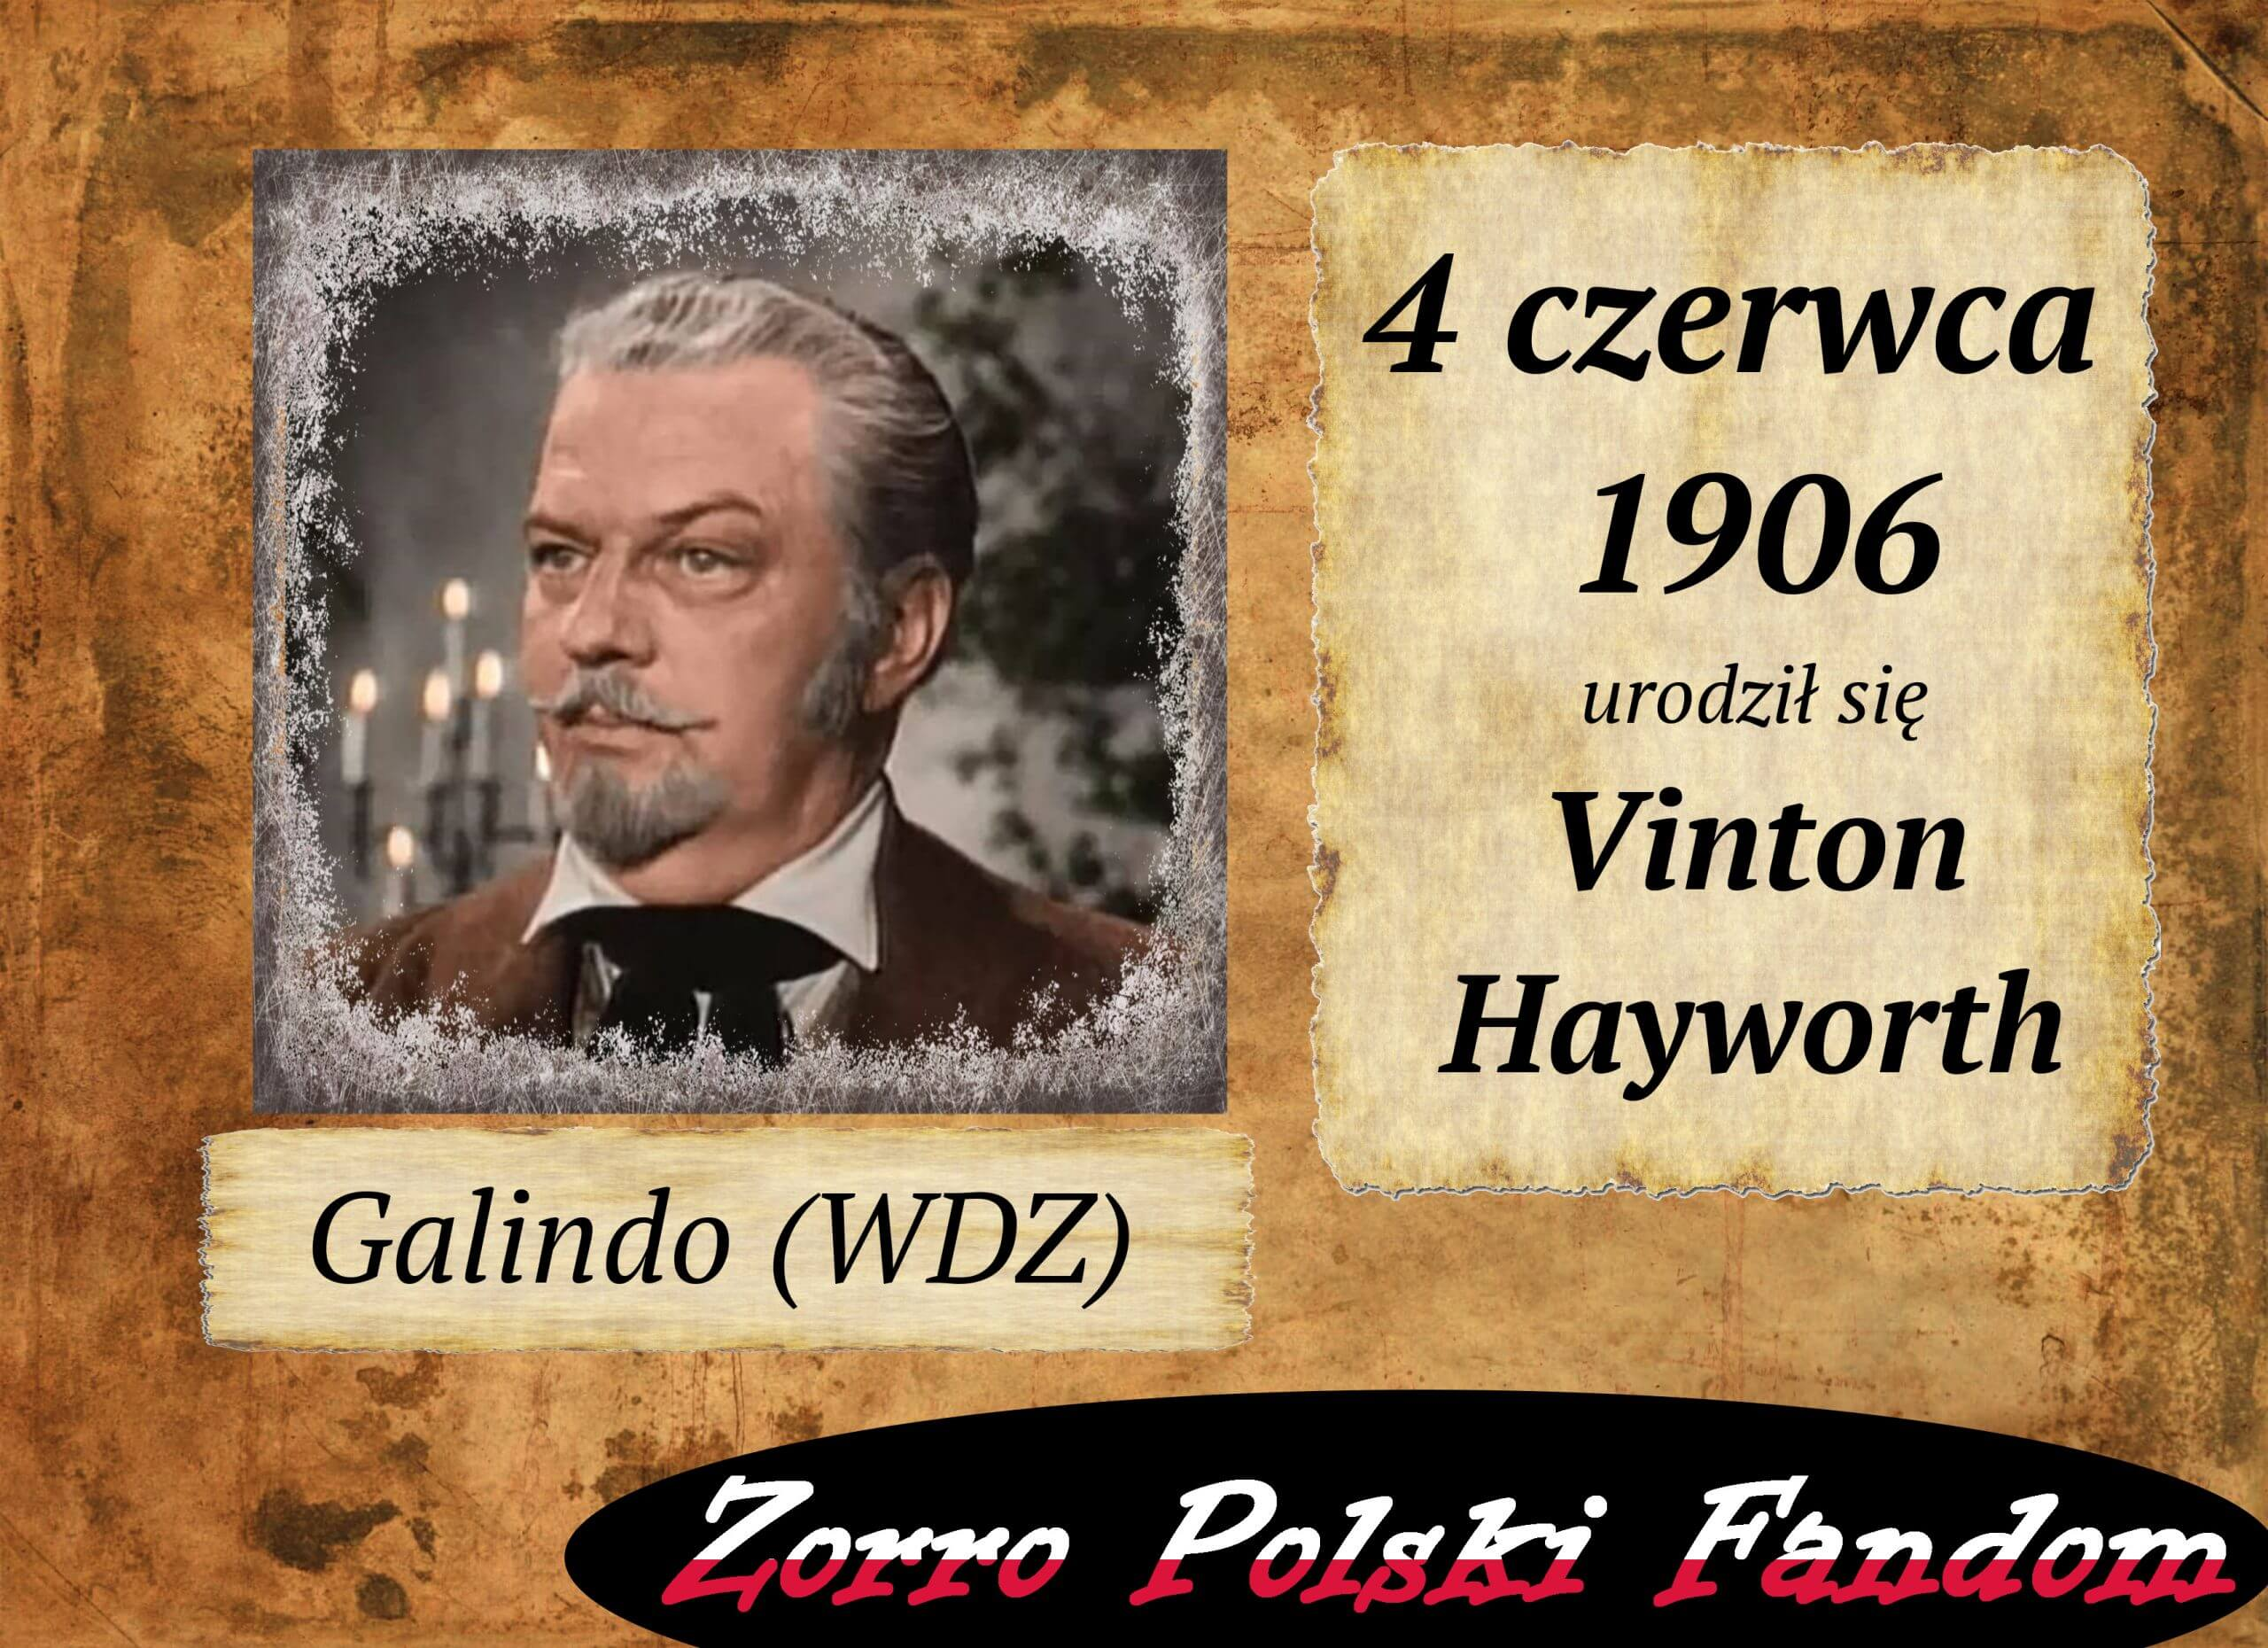 4 czerwca ur. Vinton Hayworth PL sędzia Carols Galindo Zorro